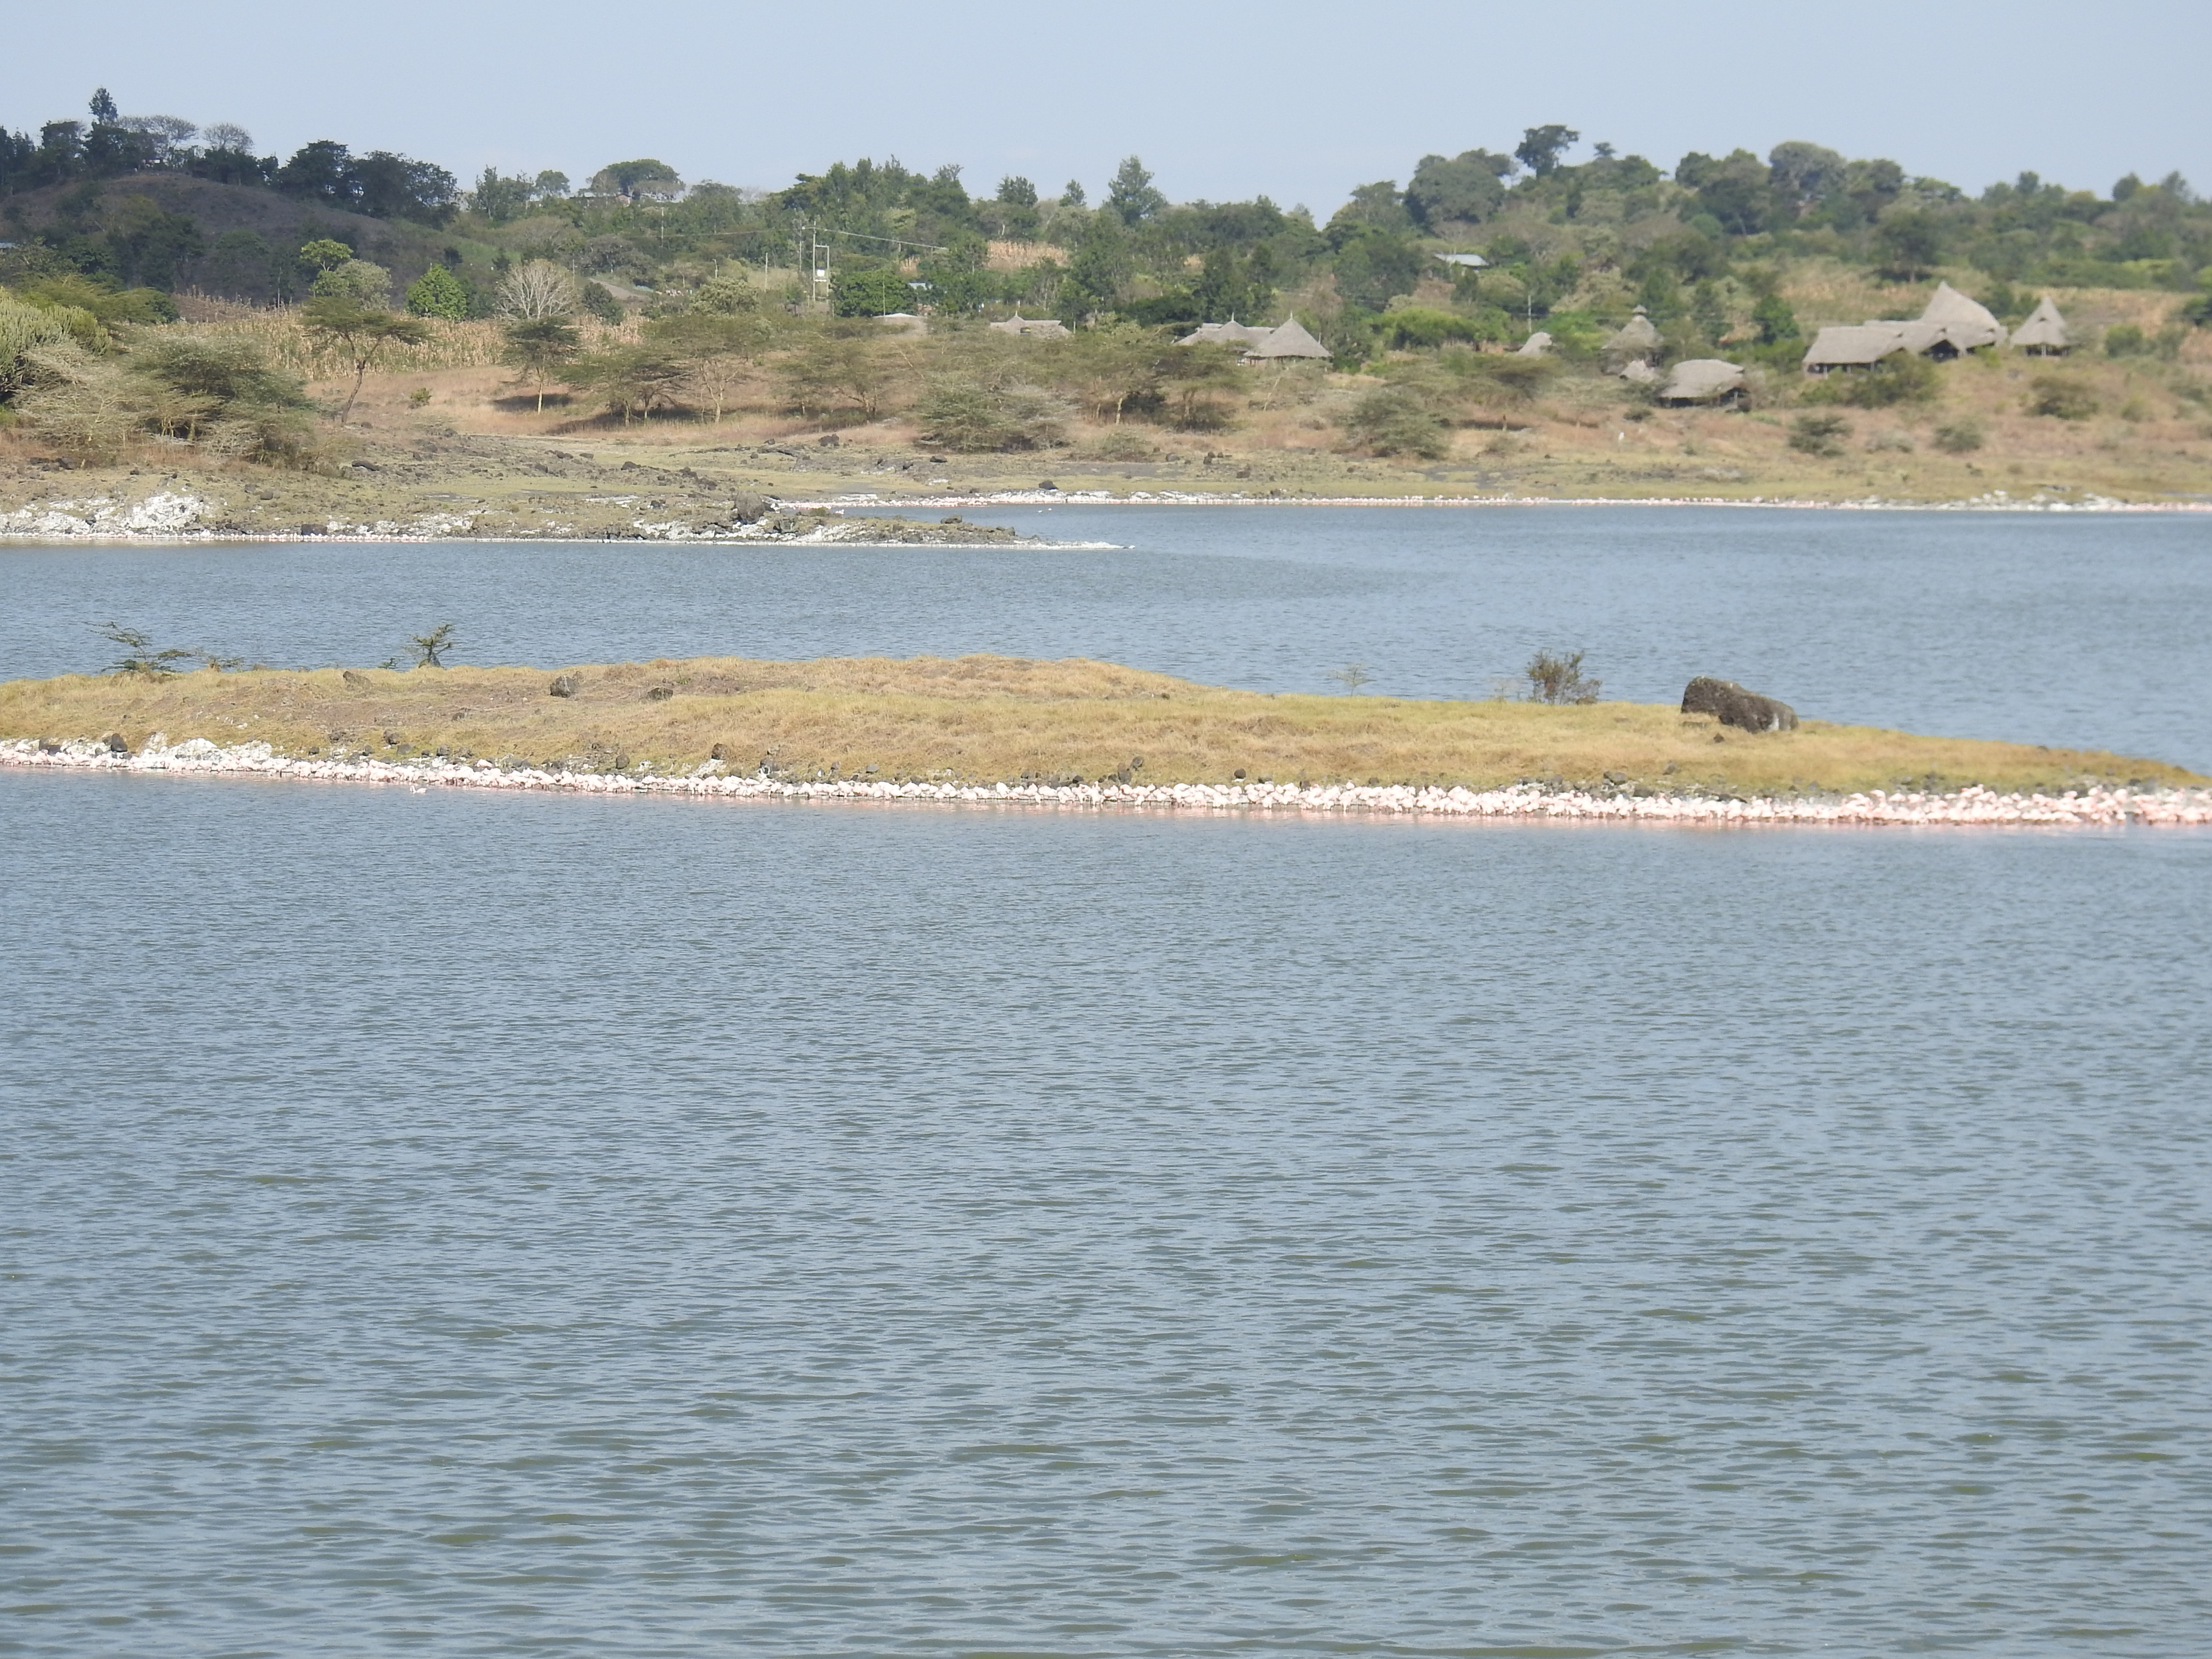 Flamingo_island.jpg